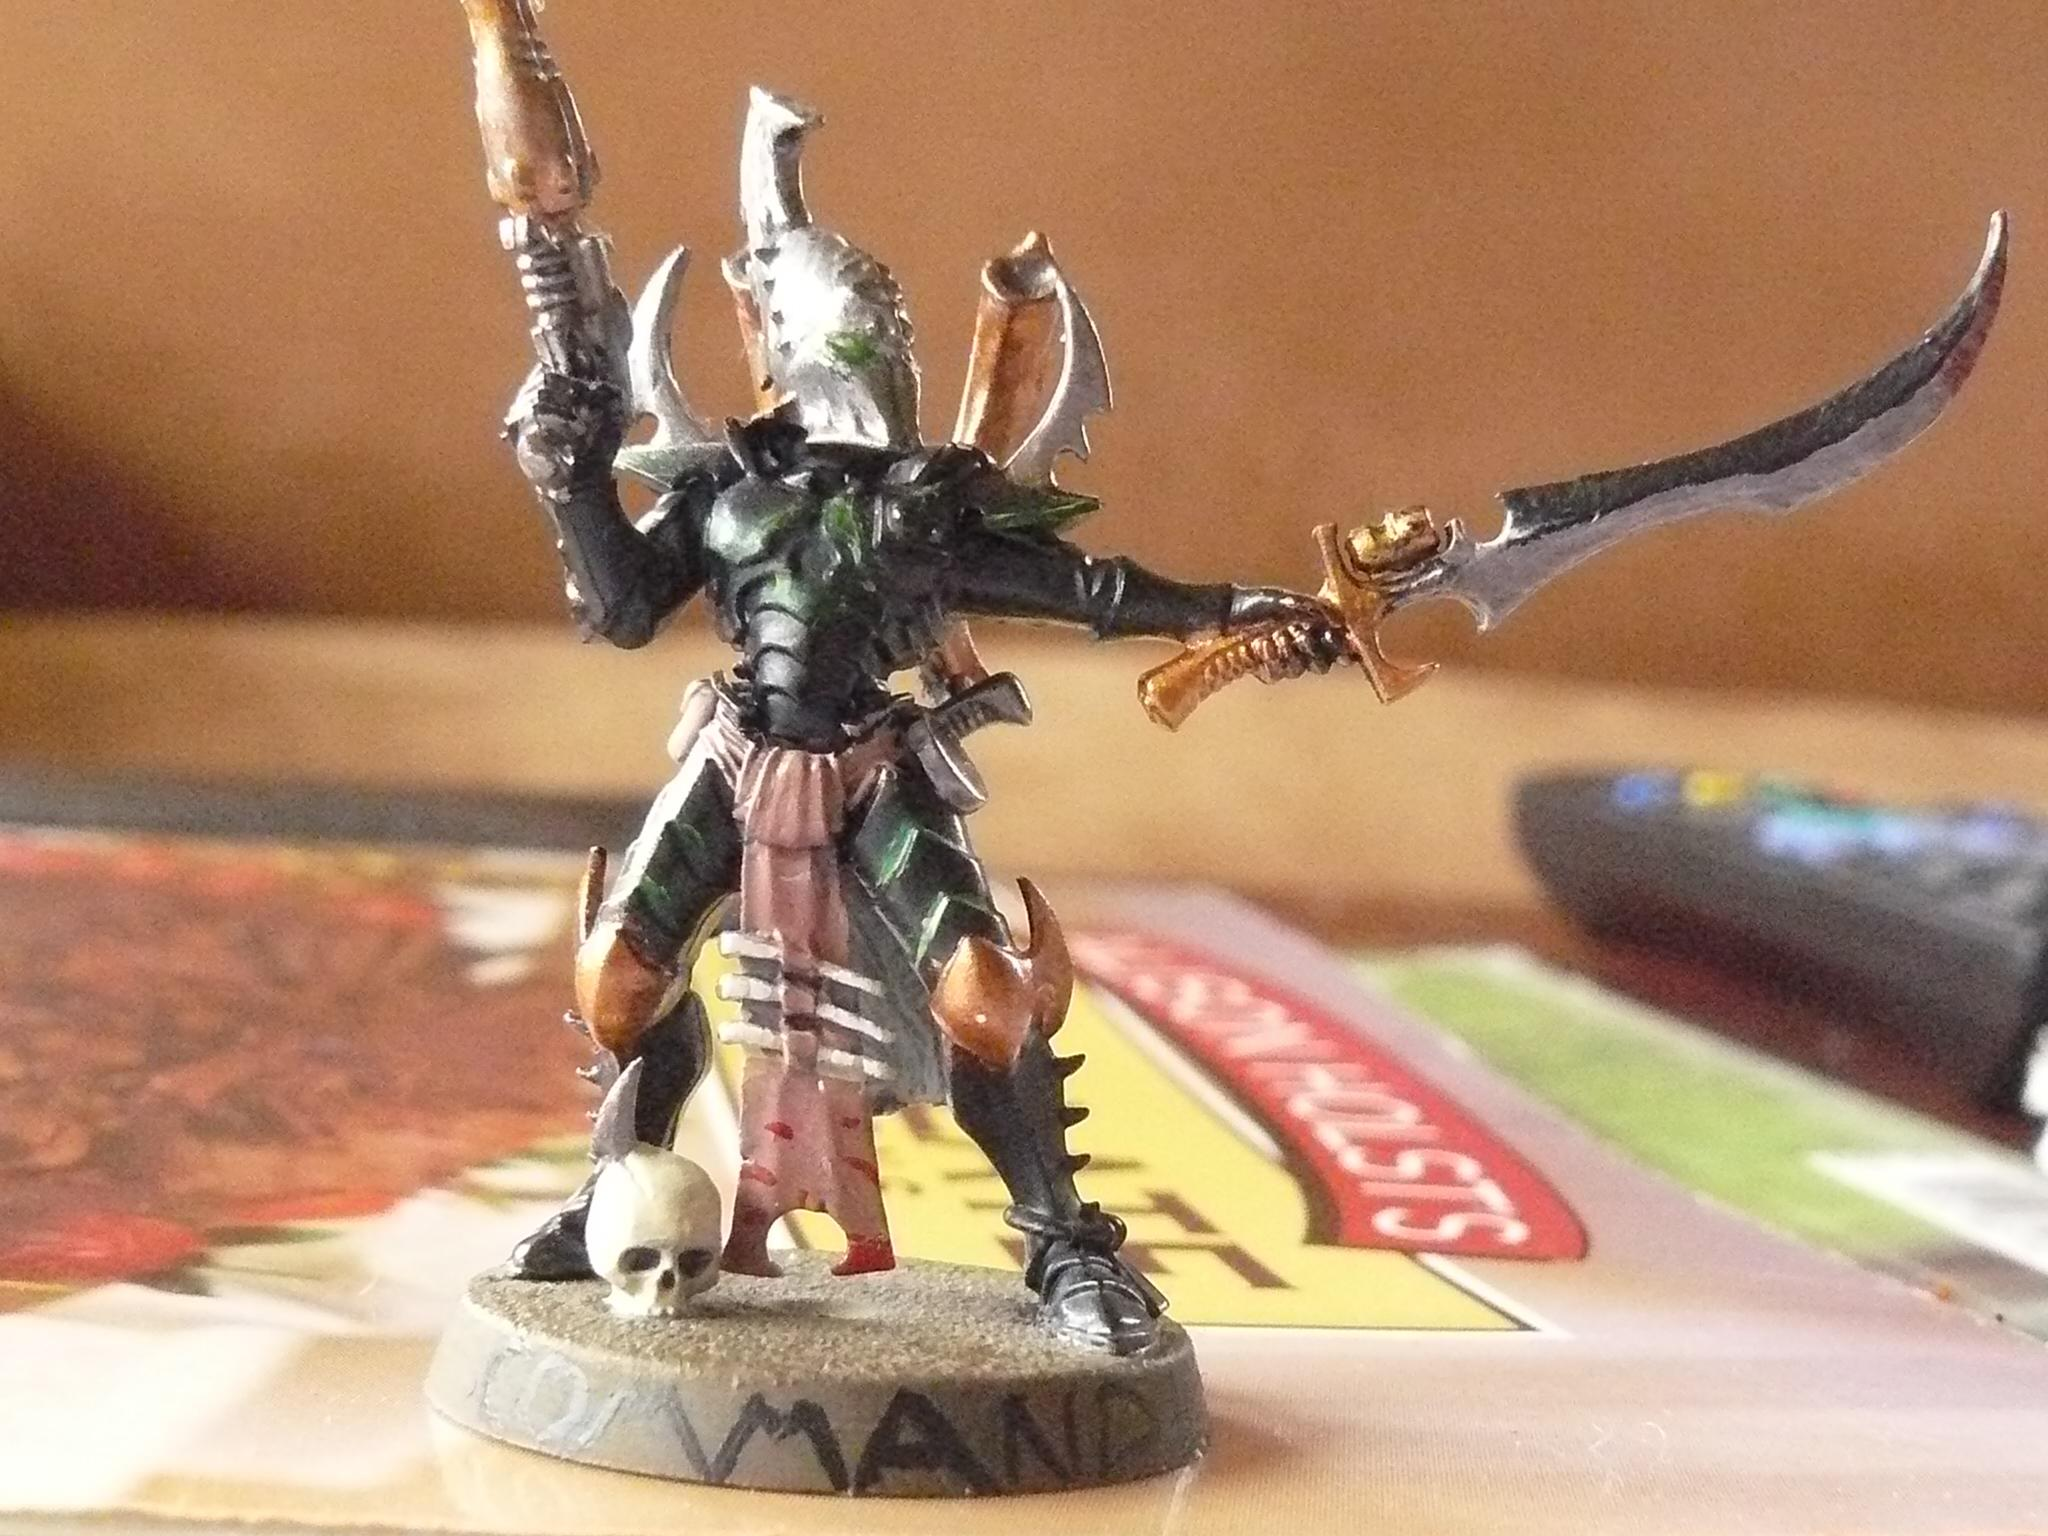 Bob, Commander, Dark Eldar, Sword., Sybarite